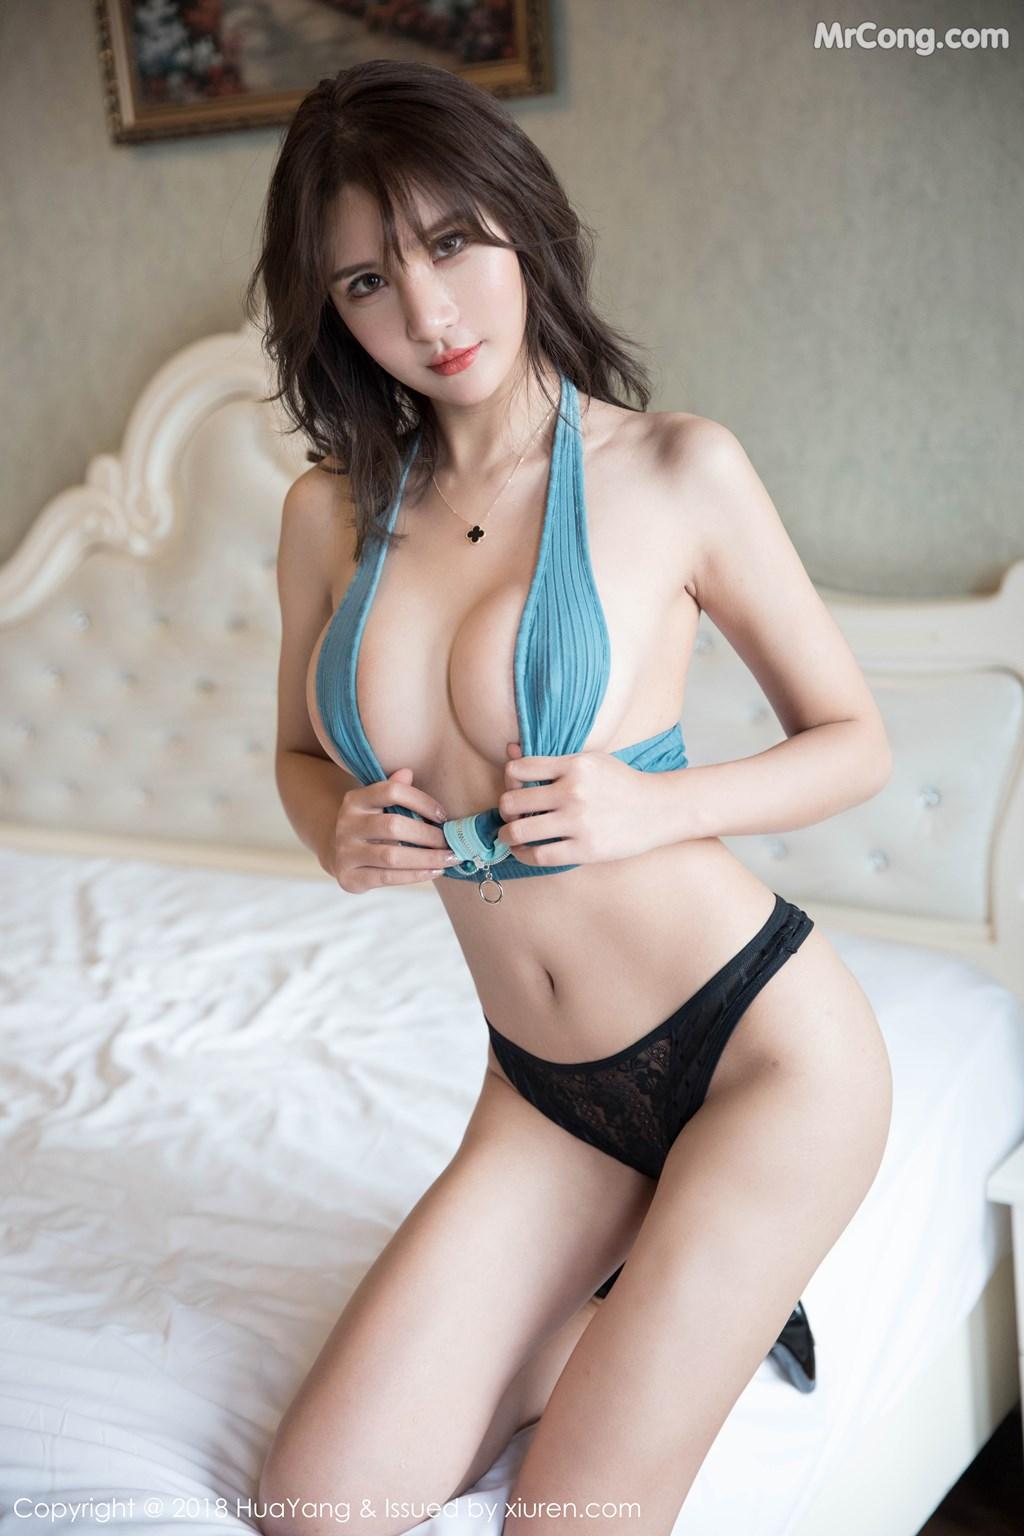 Image HuaYang-2018.12.13-Vol.099-SOLO-MrCong.com-045 in post HuaYang 2018.12.13 Vol.099: Người mẫu SOLO-尹菲 (47 ảnh)